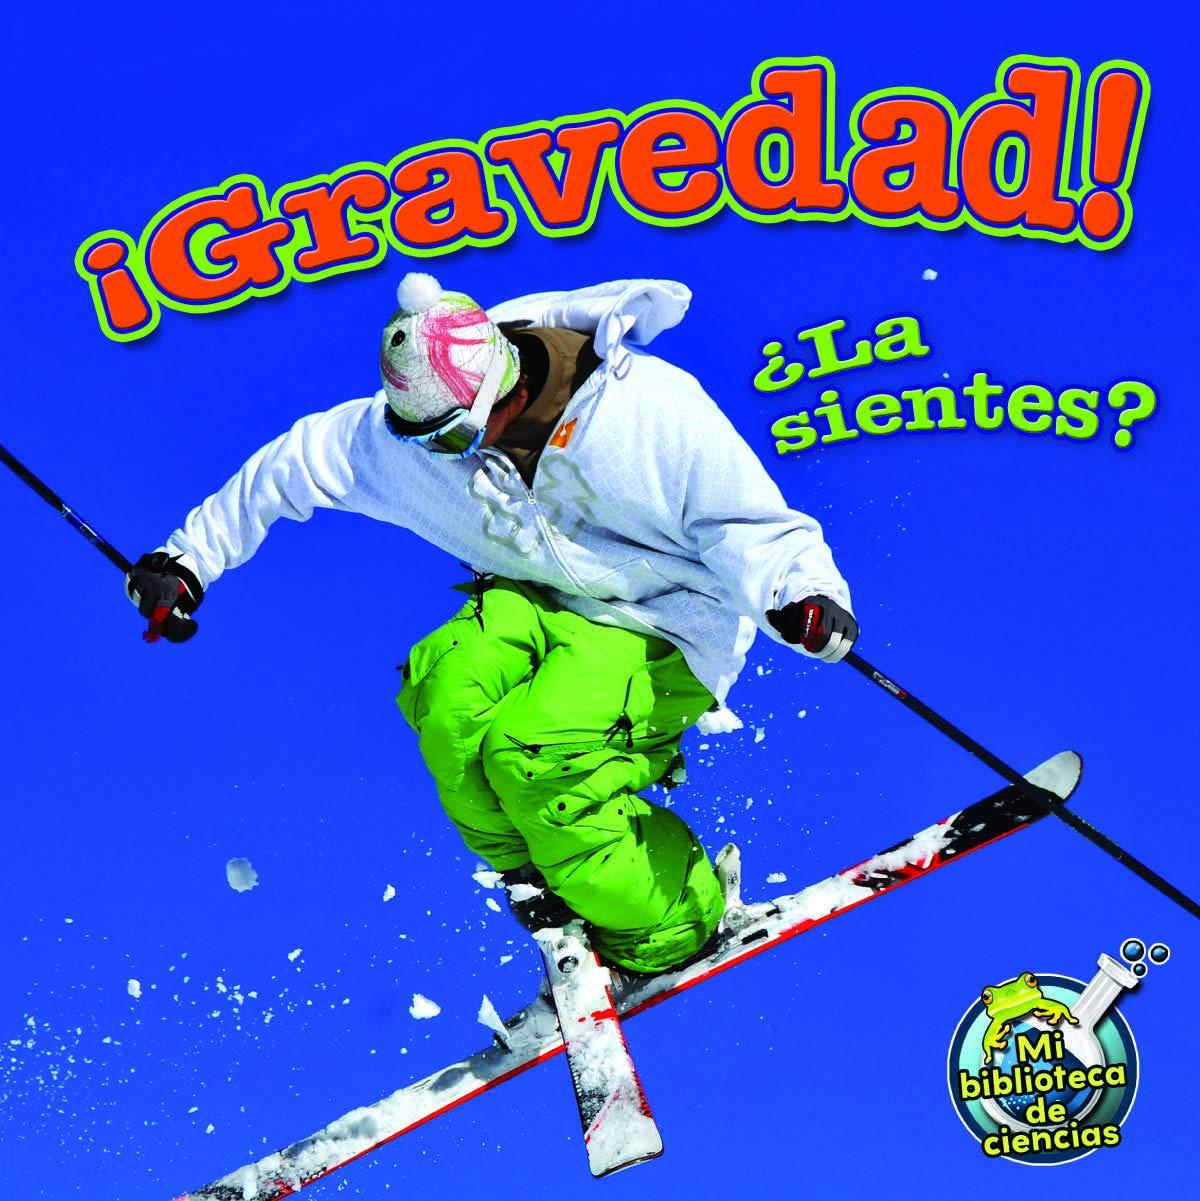 ¡Gravedad! ¿La sientes?: Gravity! Do You Feel It? (My Science Library) pdf epub